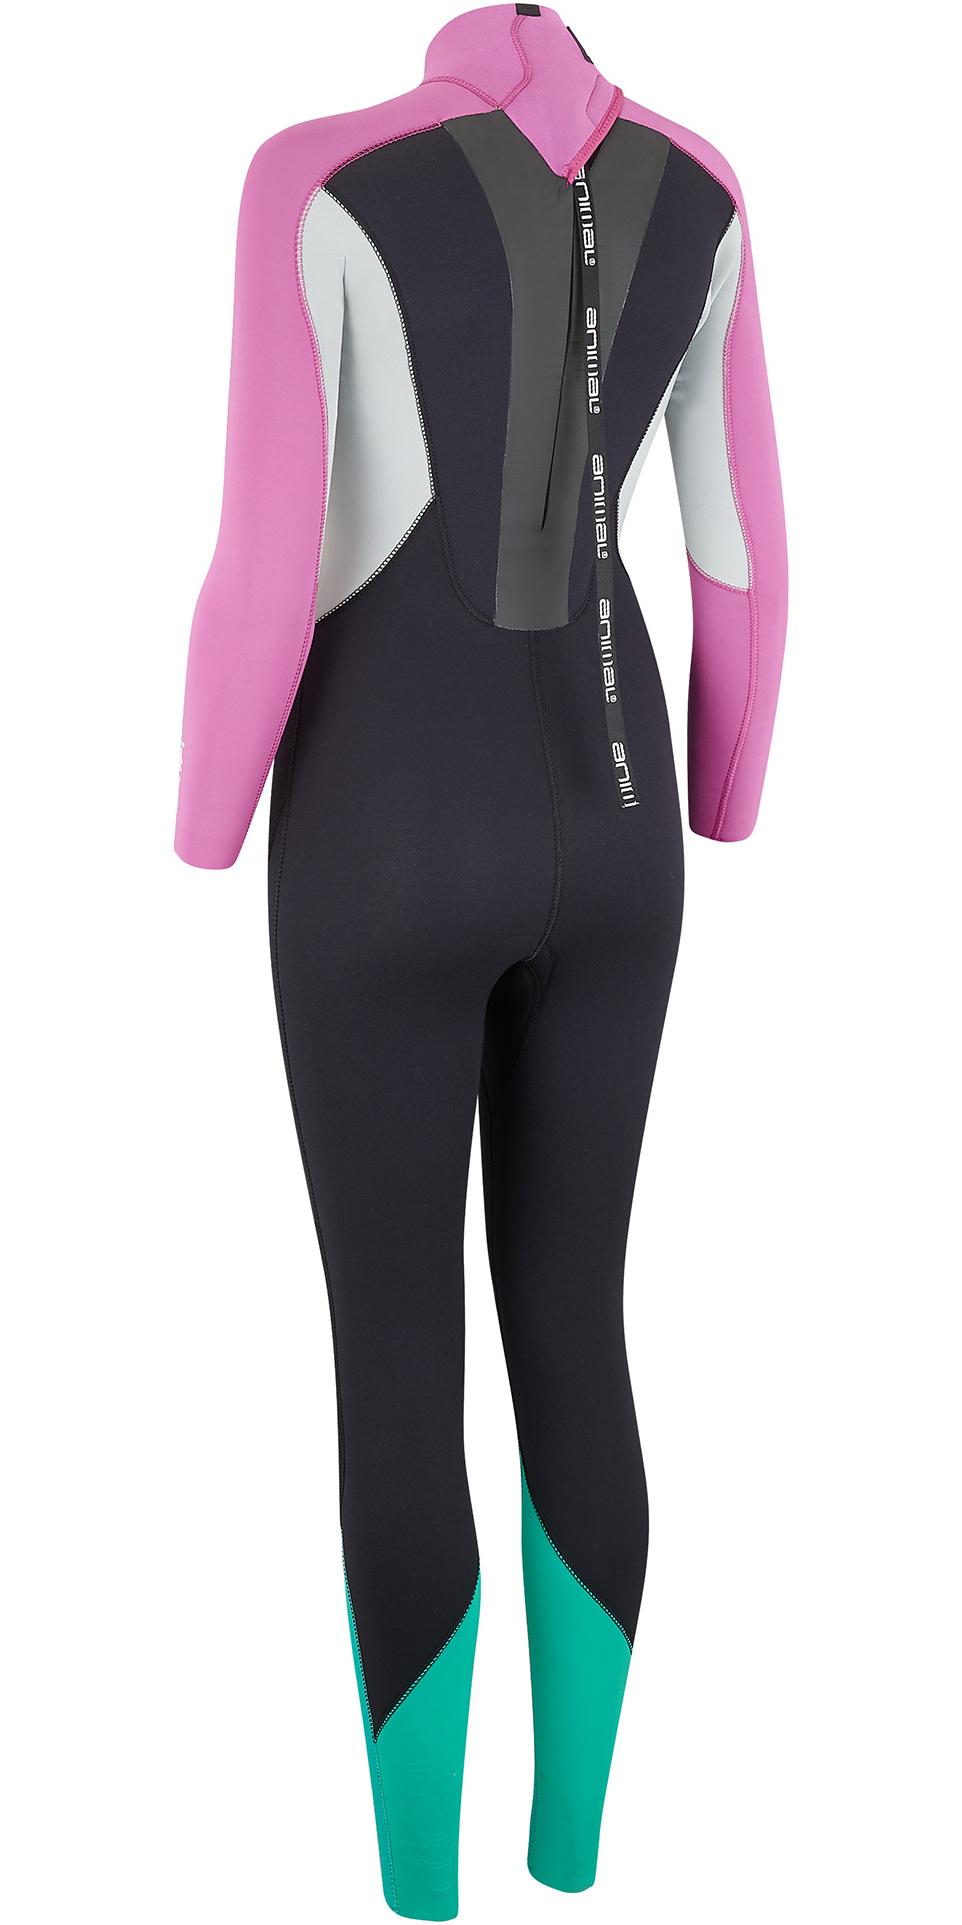 2019 Animal Womens Lava 4/3mm Back Zip GBS Wetsuit Black AW9SQ301